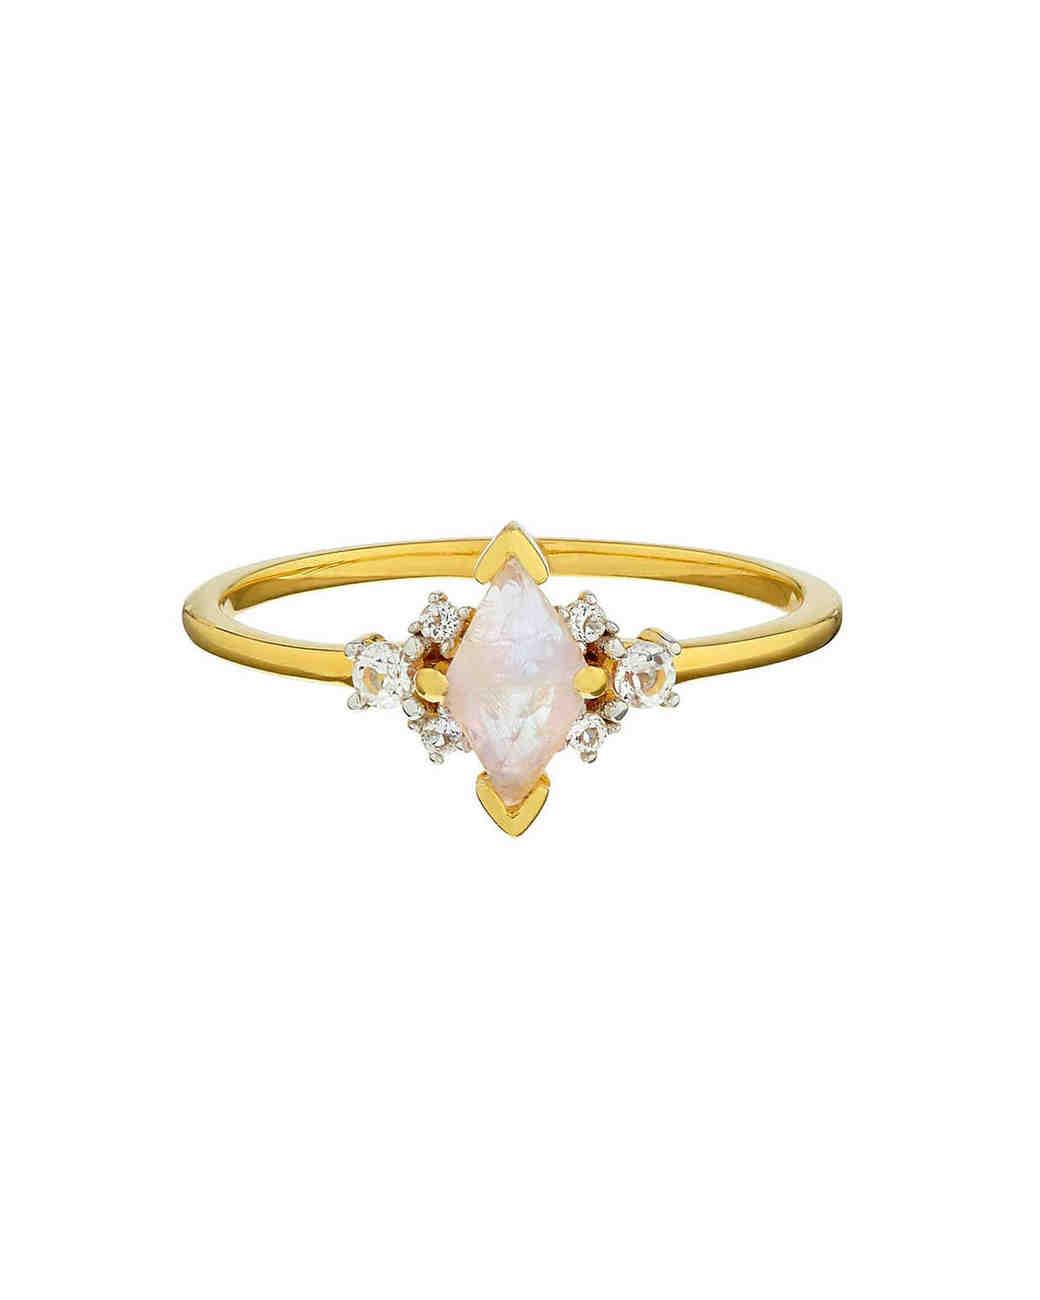 Moonstone Engagement Ring, Carrie Elizabeth Jewellery